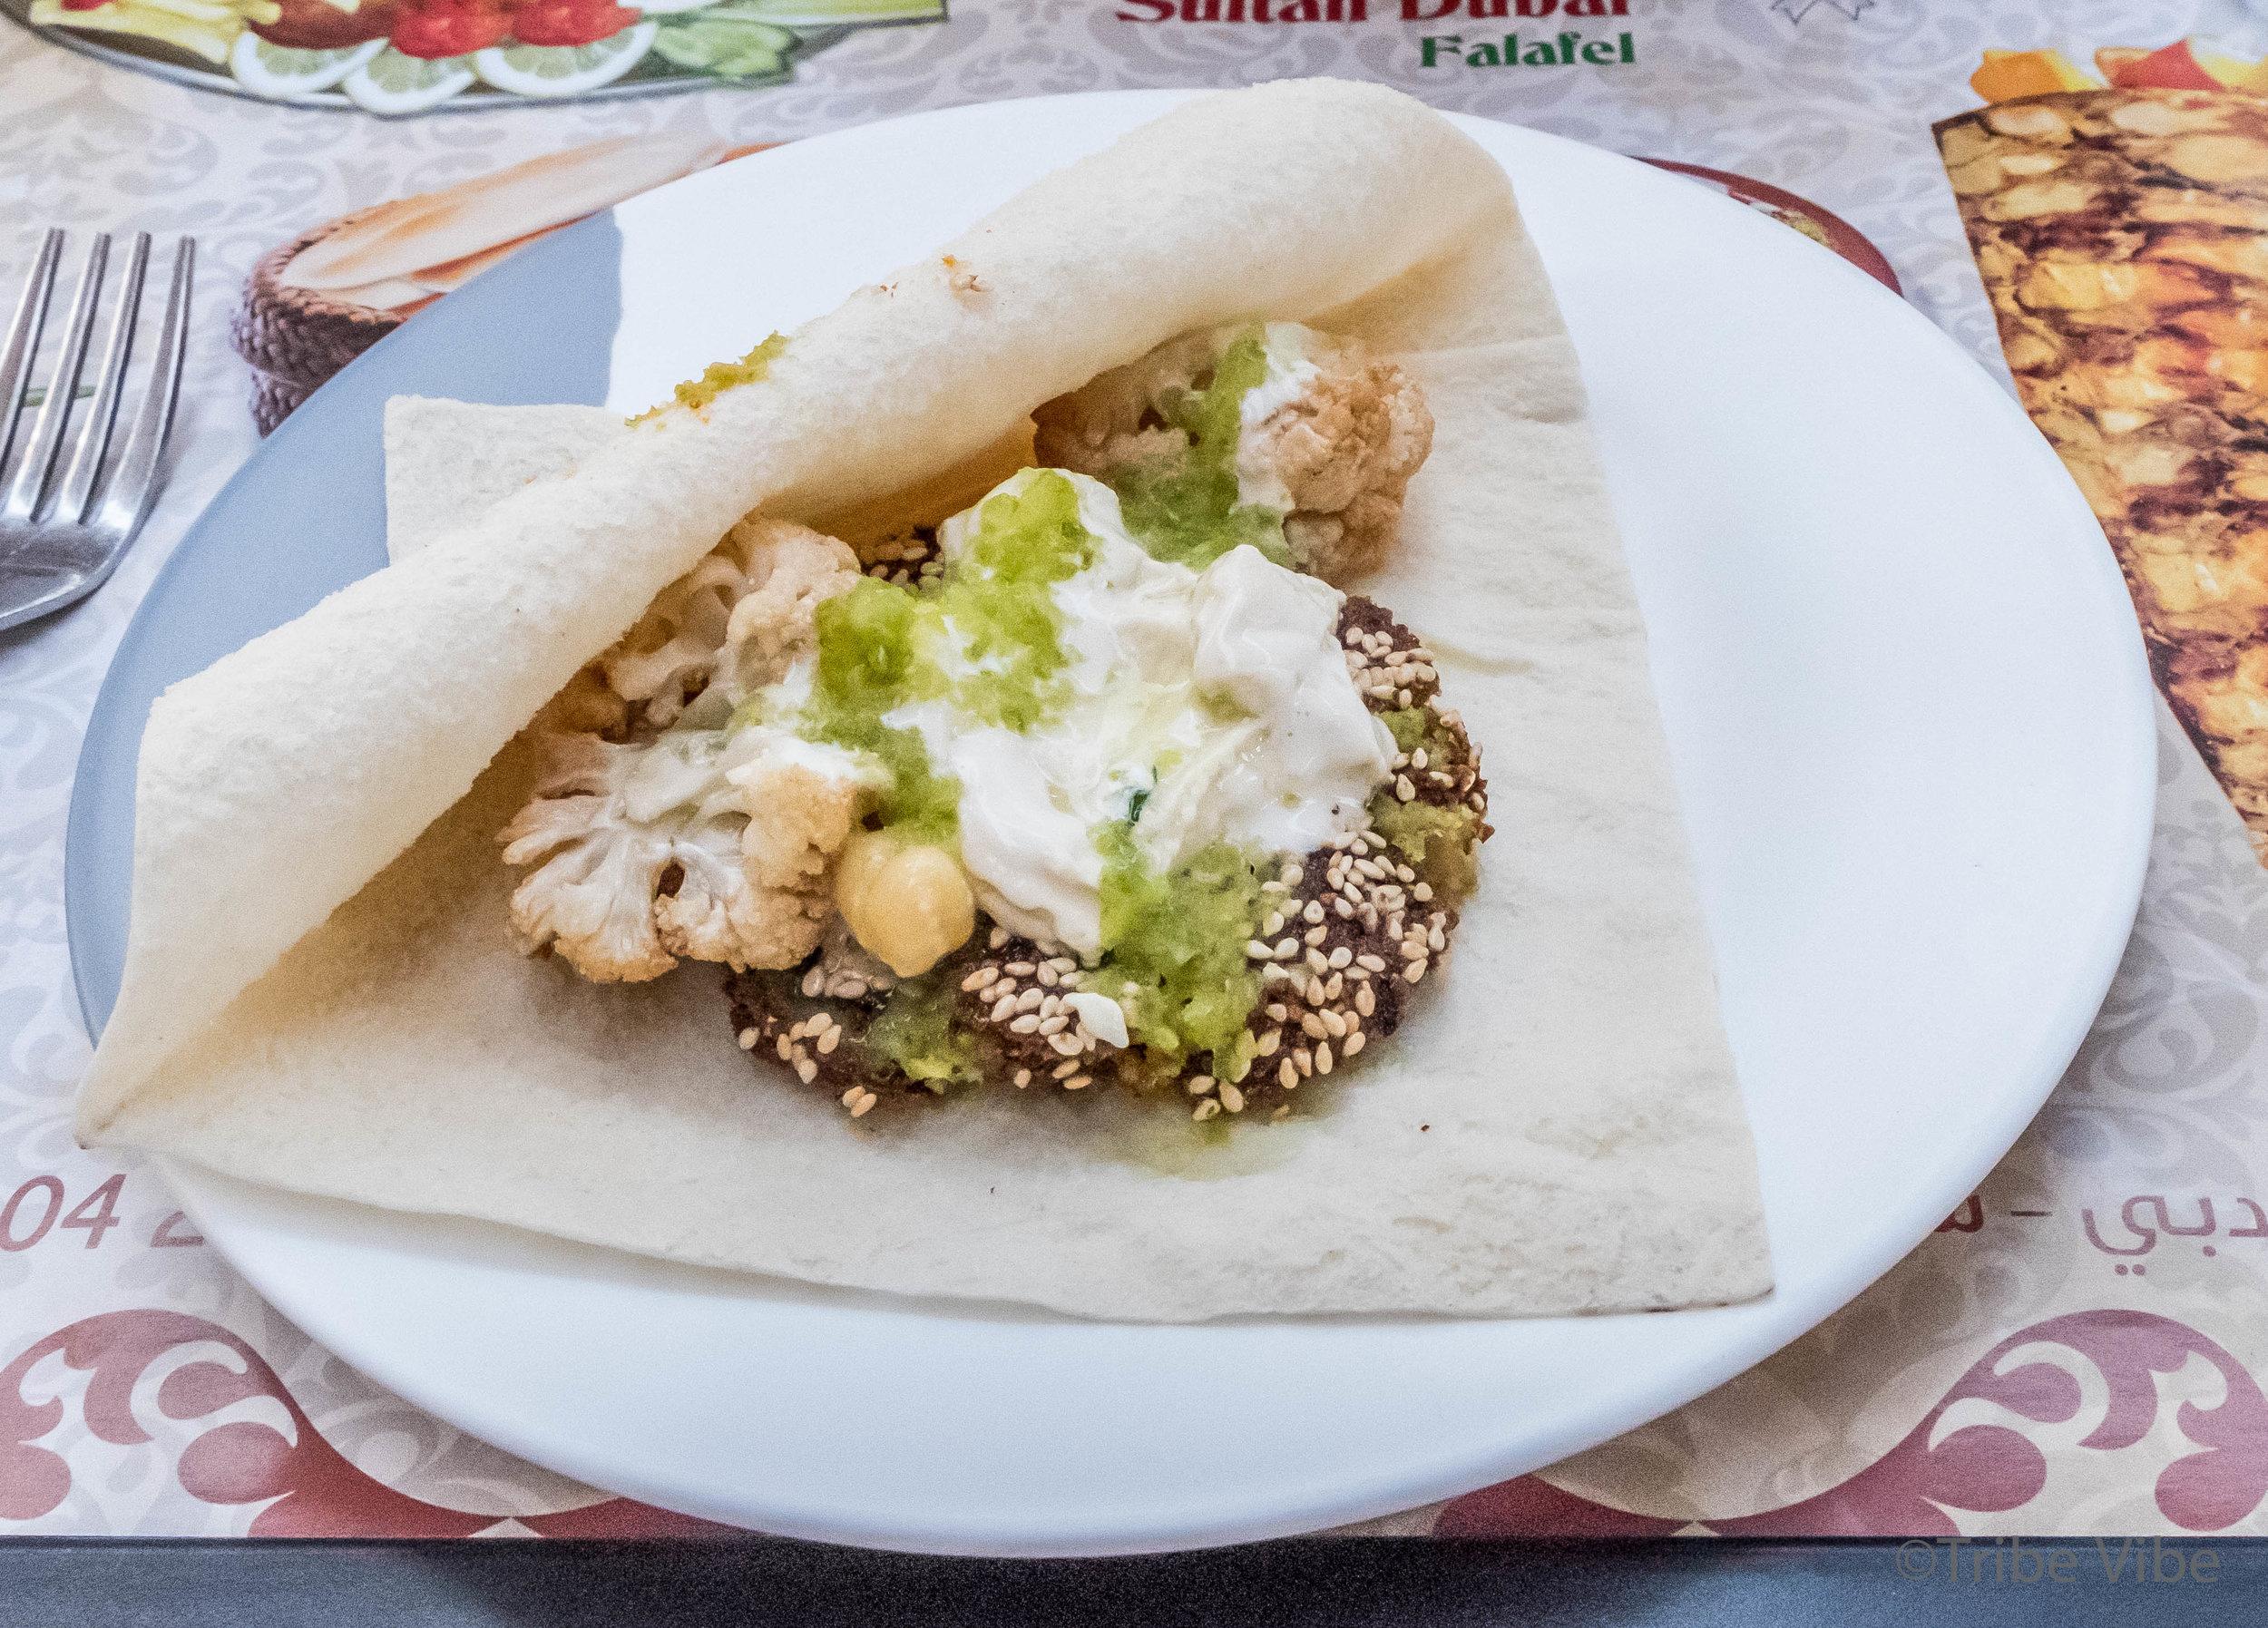 The best falafel in Dubai